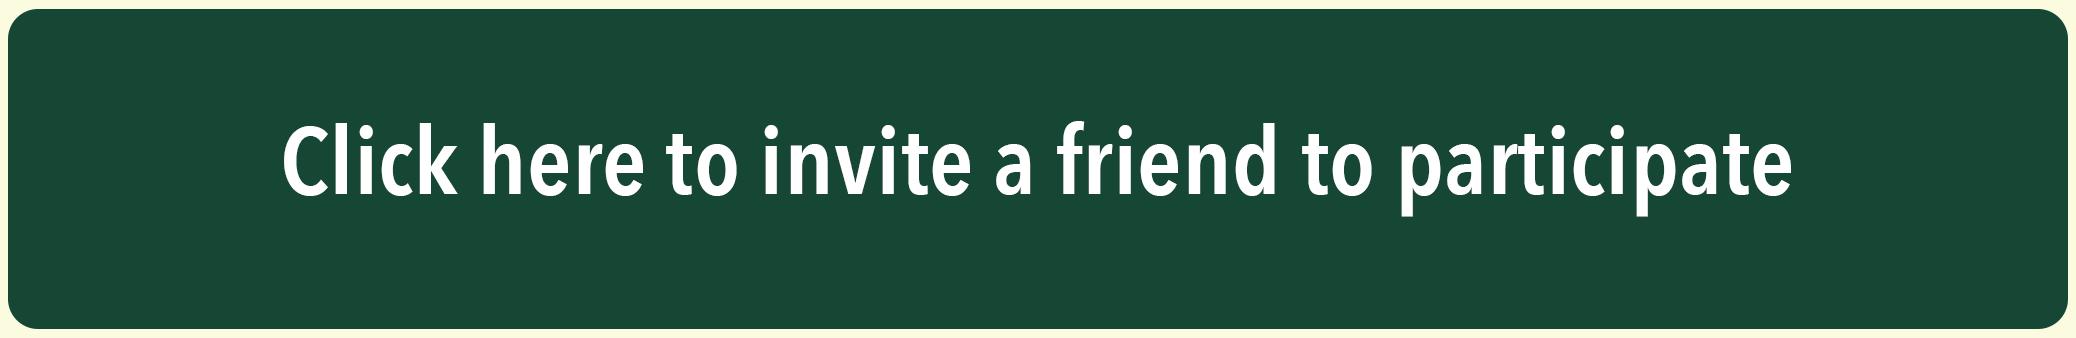 invite_a_friend_v2.png